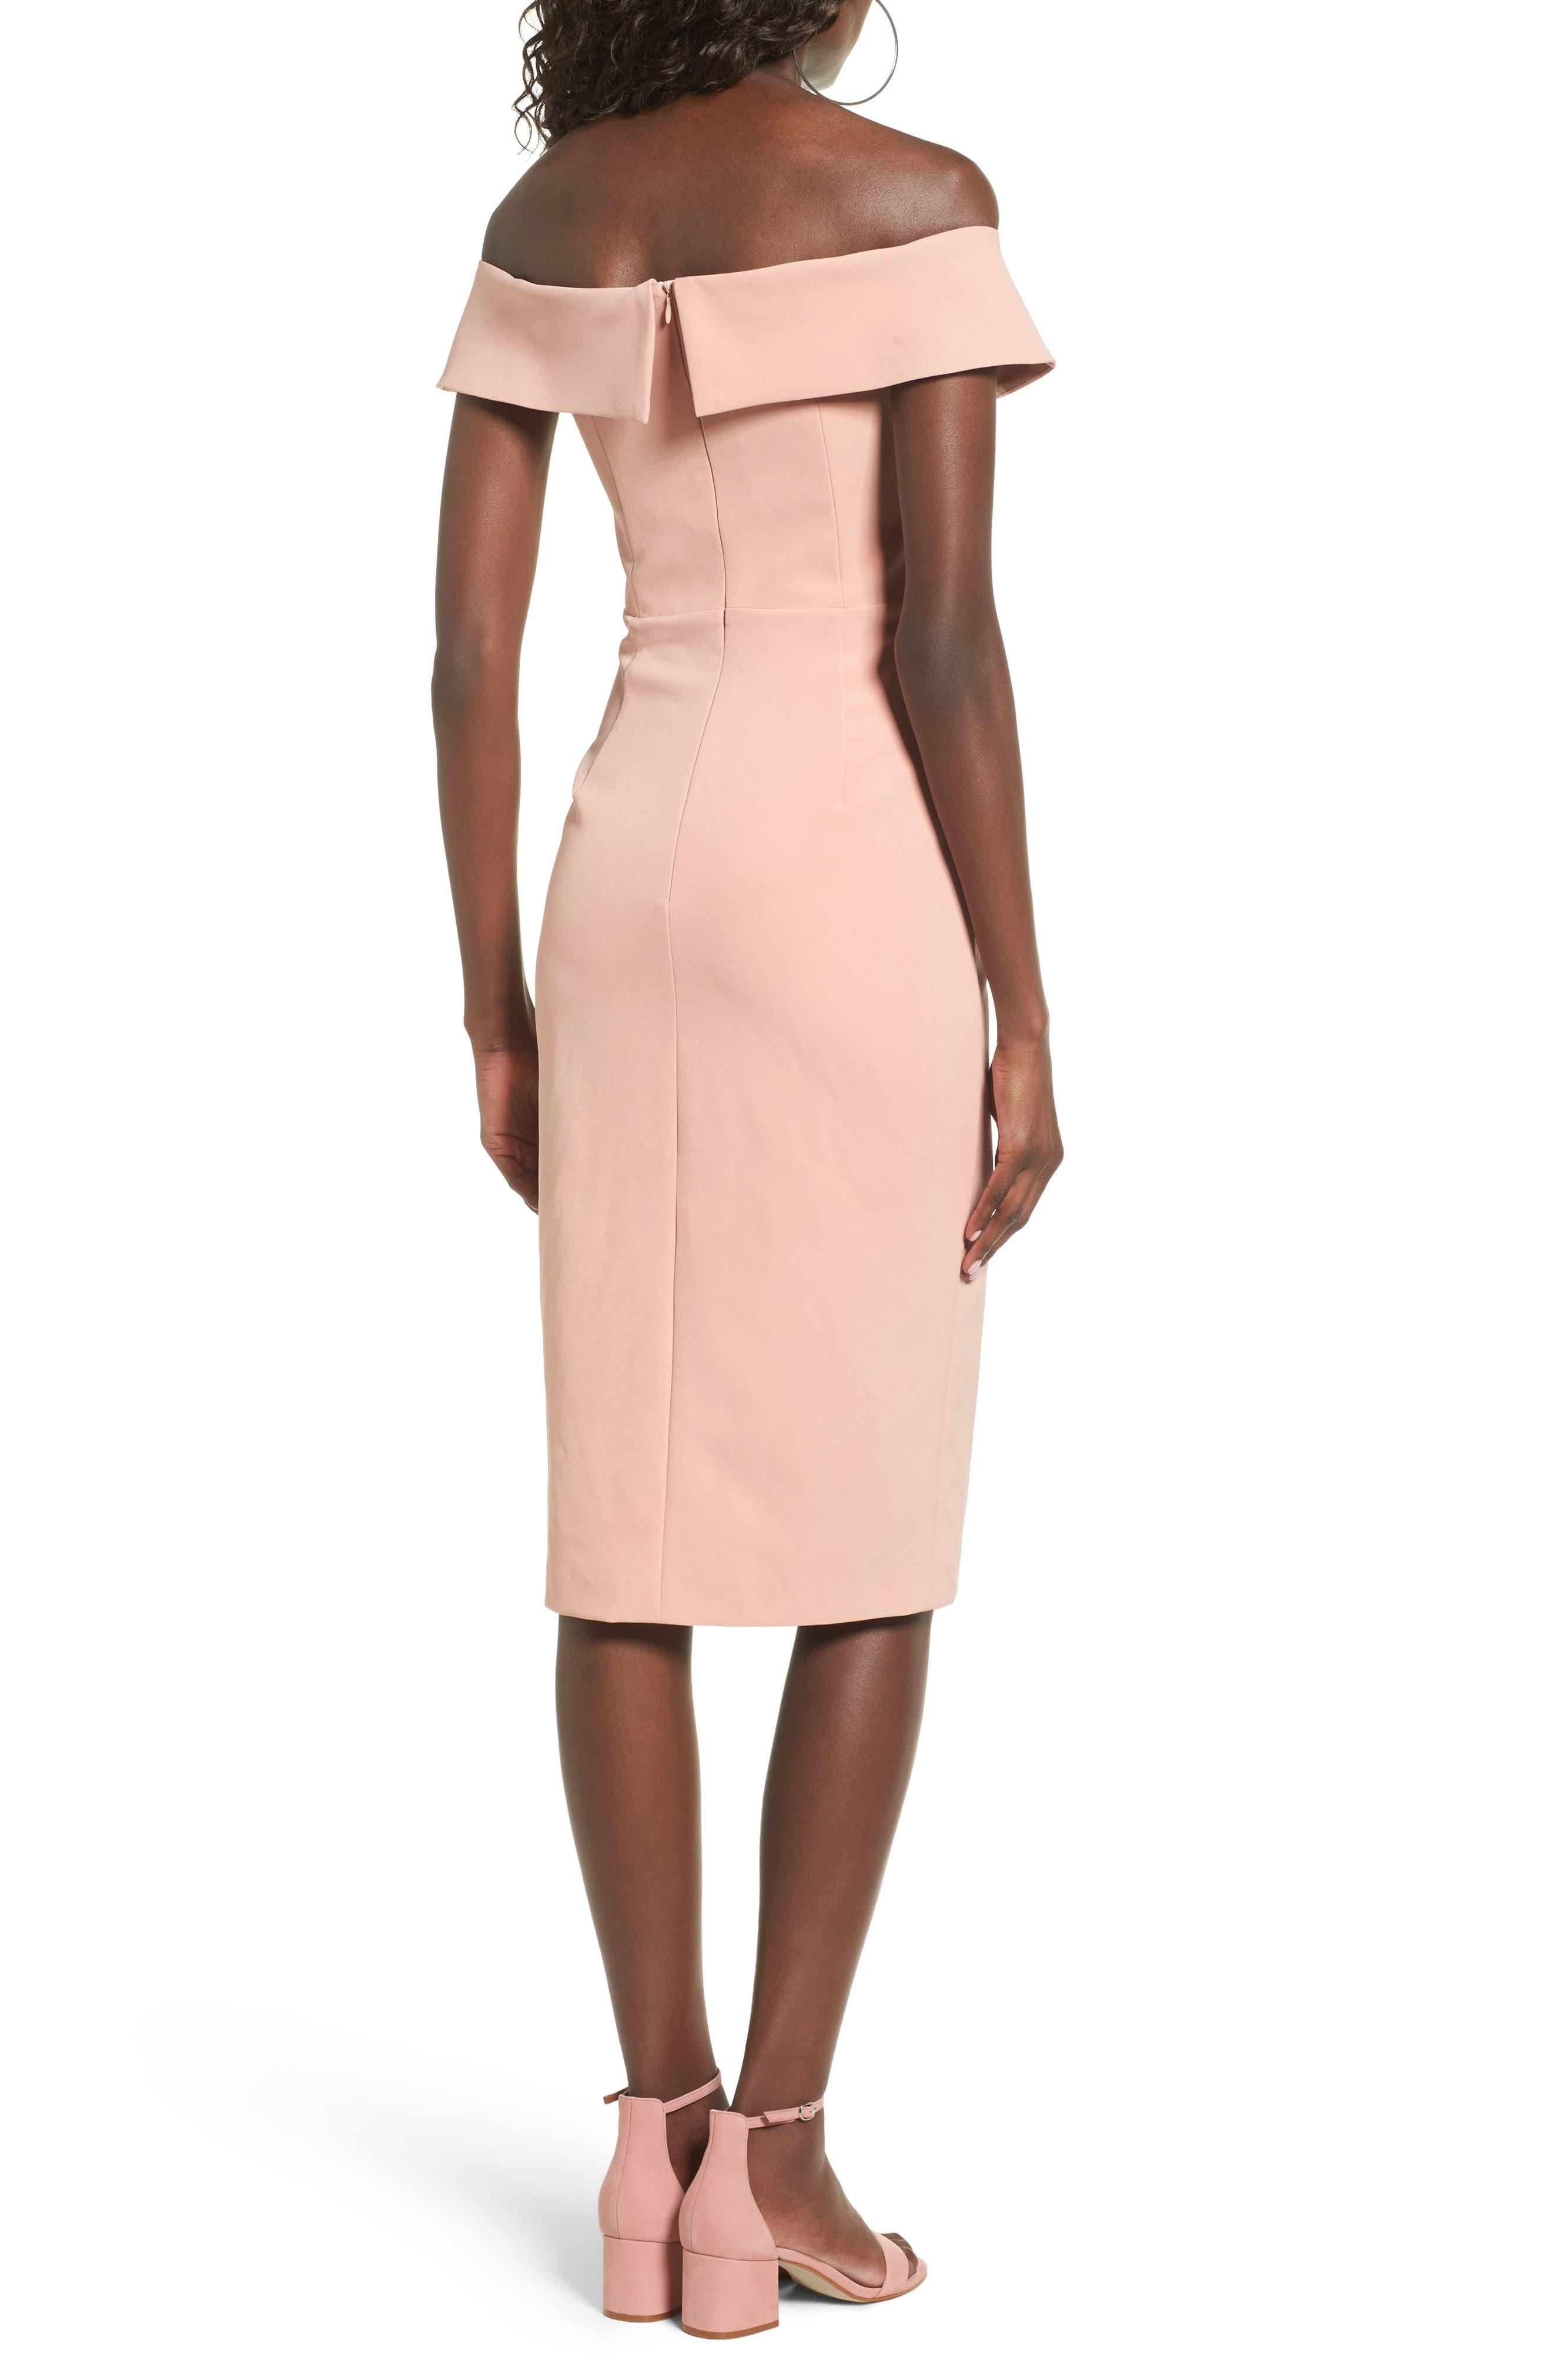 Bella Midi Dress,                             Alternate thumbnail 3, color,                             250